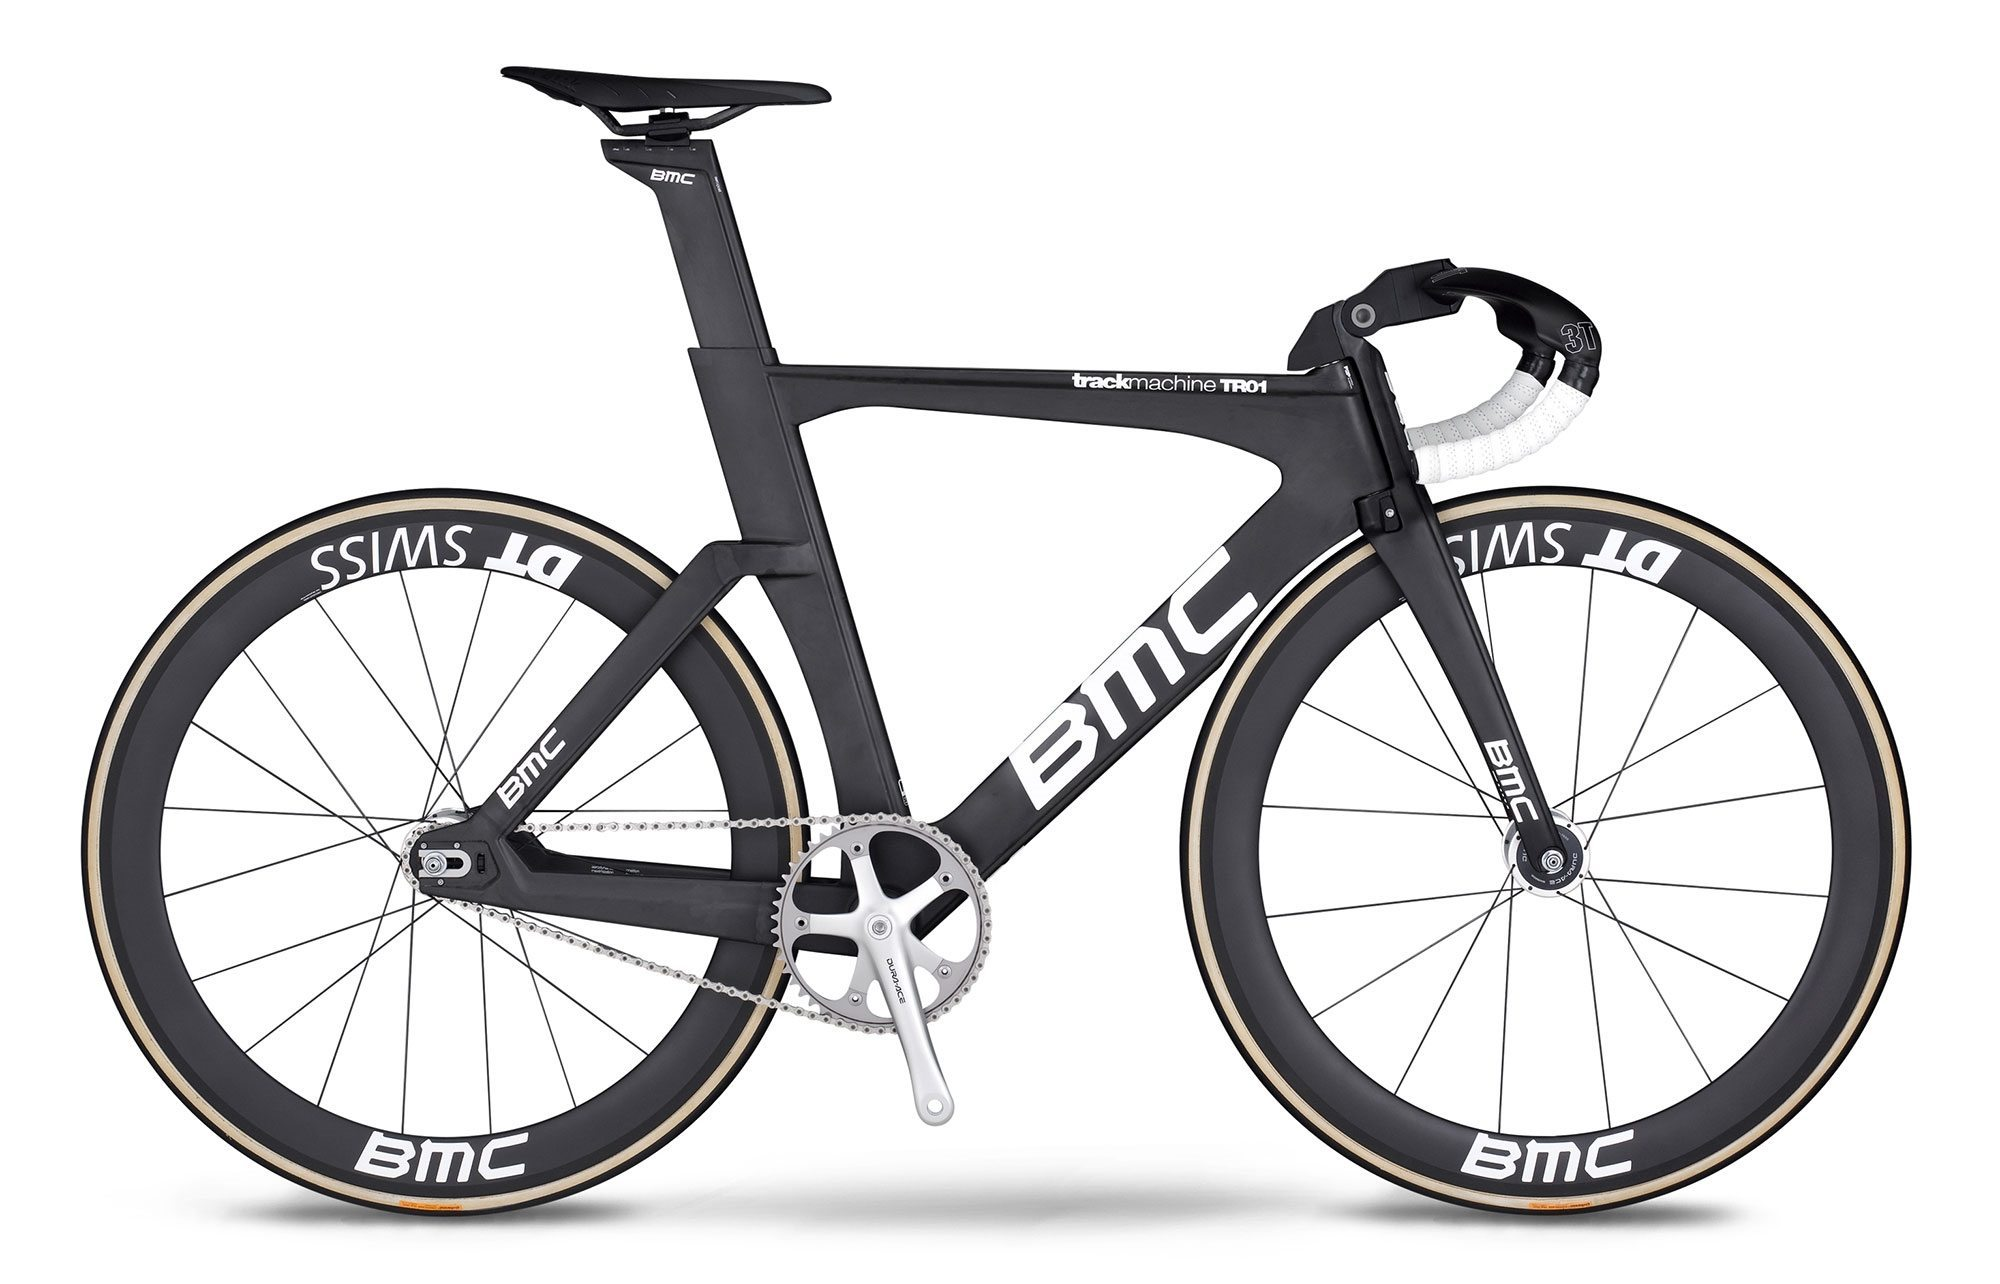 bmc machine